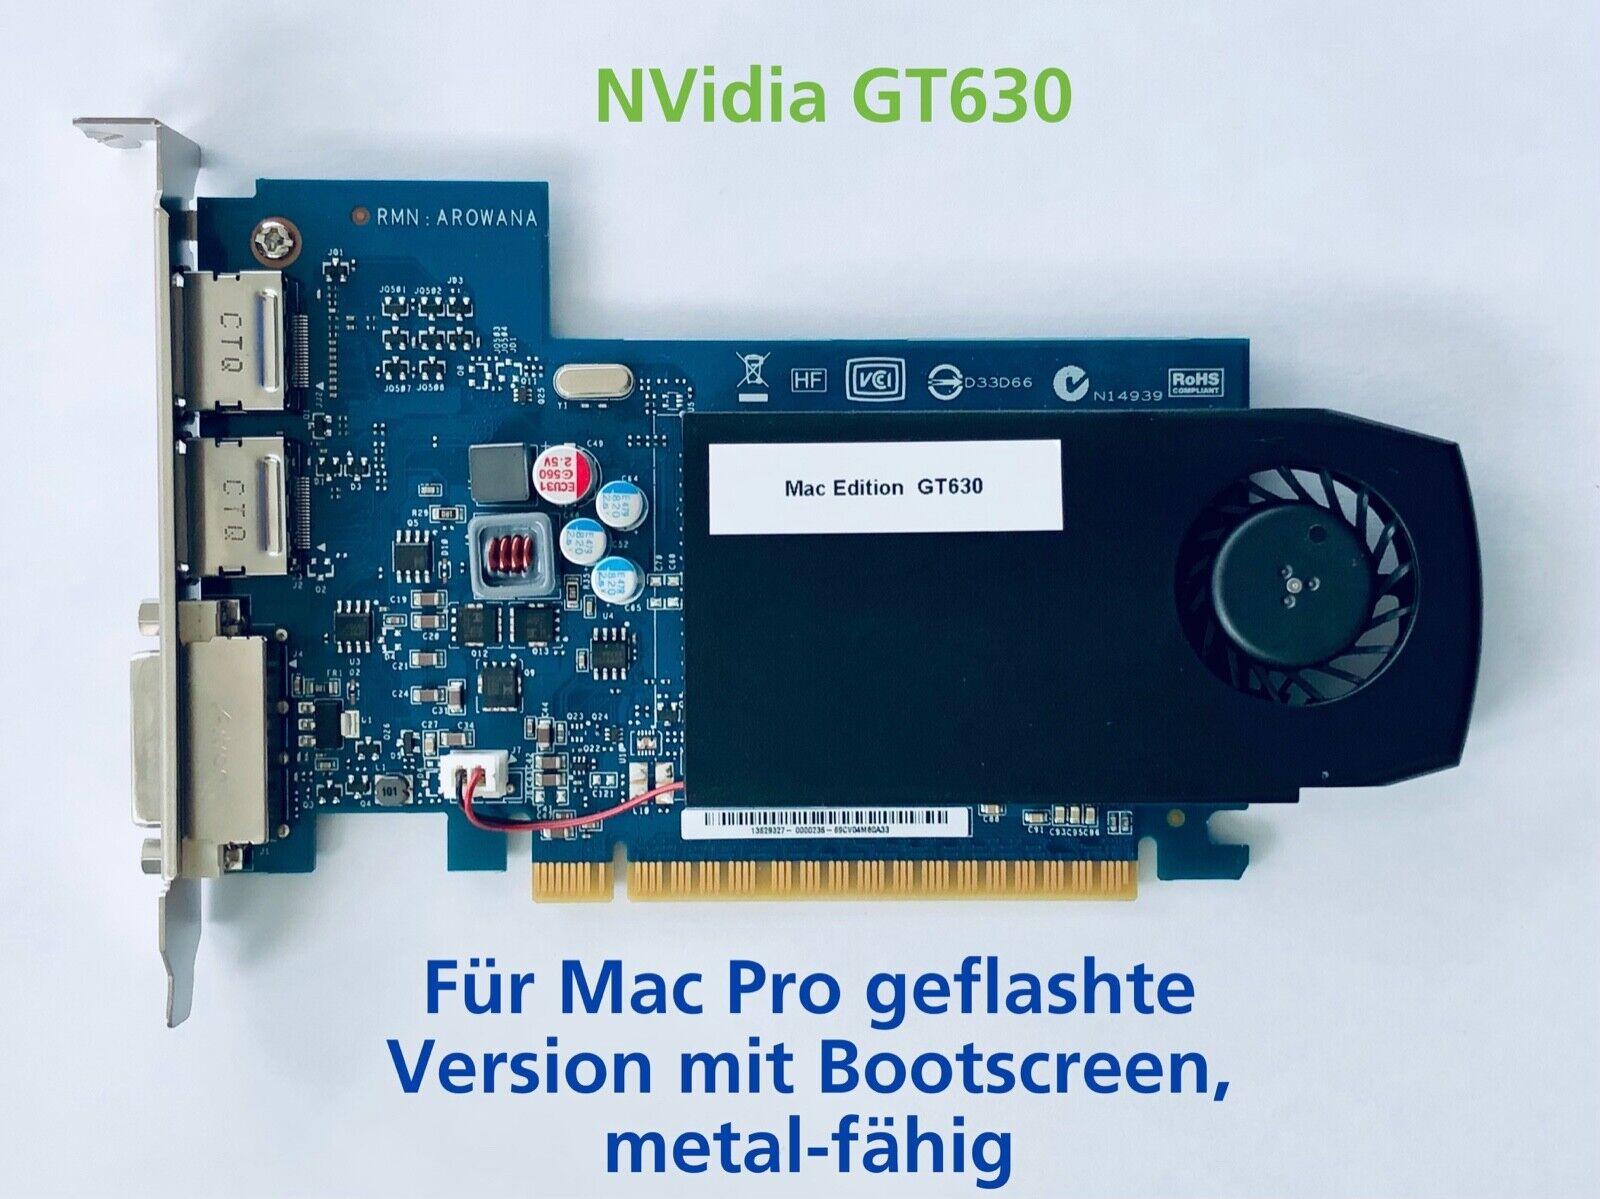 Grafikkarte NVidia GT630 Mac Edition - für Mac Pro 3,1 / 4,1 / 5,1 - Bootscreen!